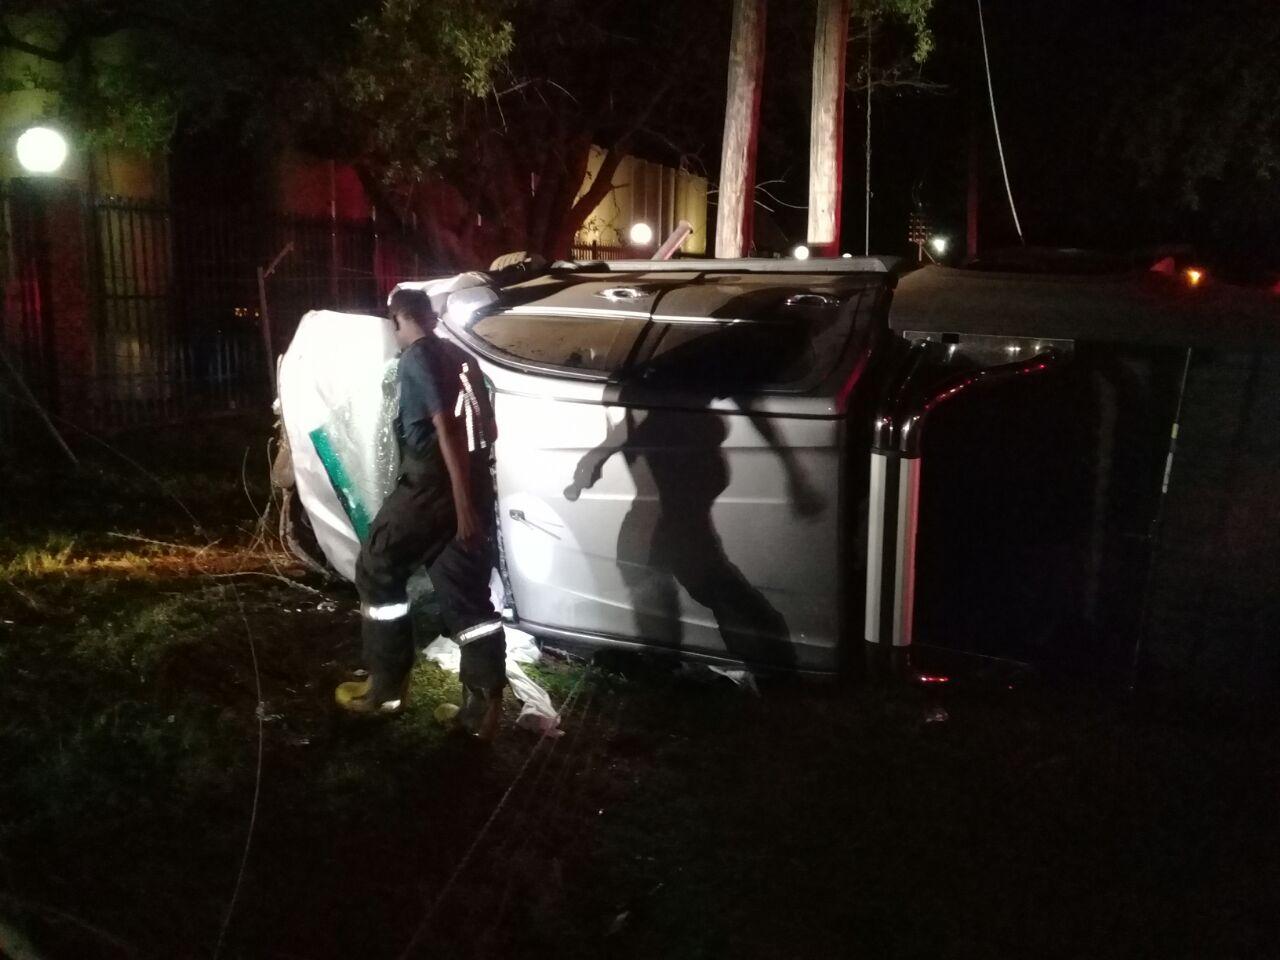 Two bakkies collide leaving three injured on the R529 in Letsitele, Limpopo